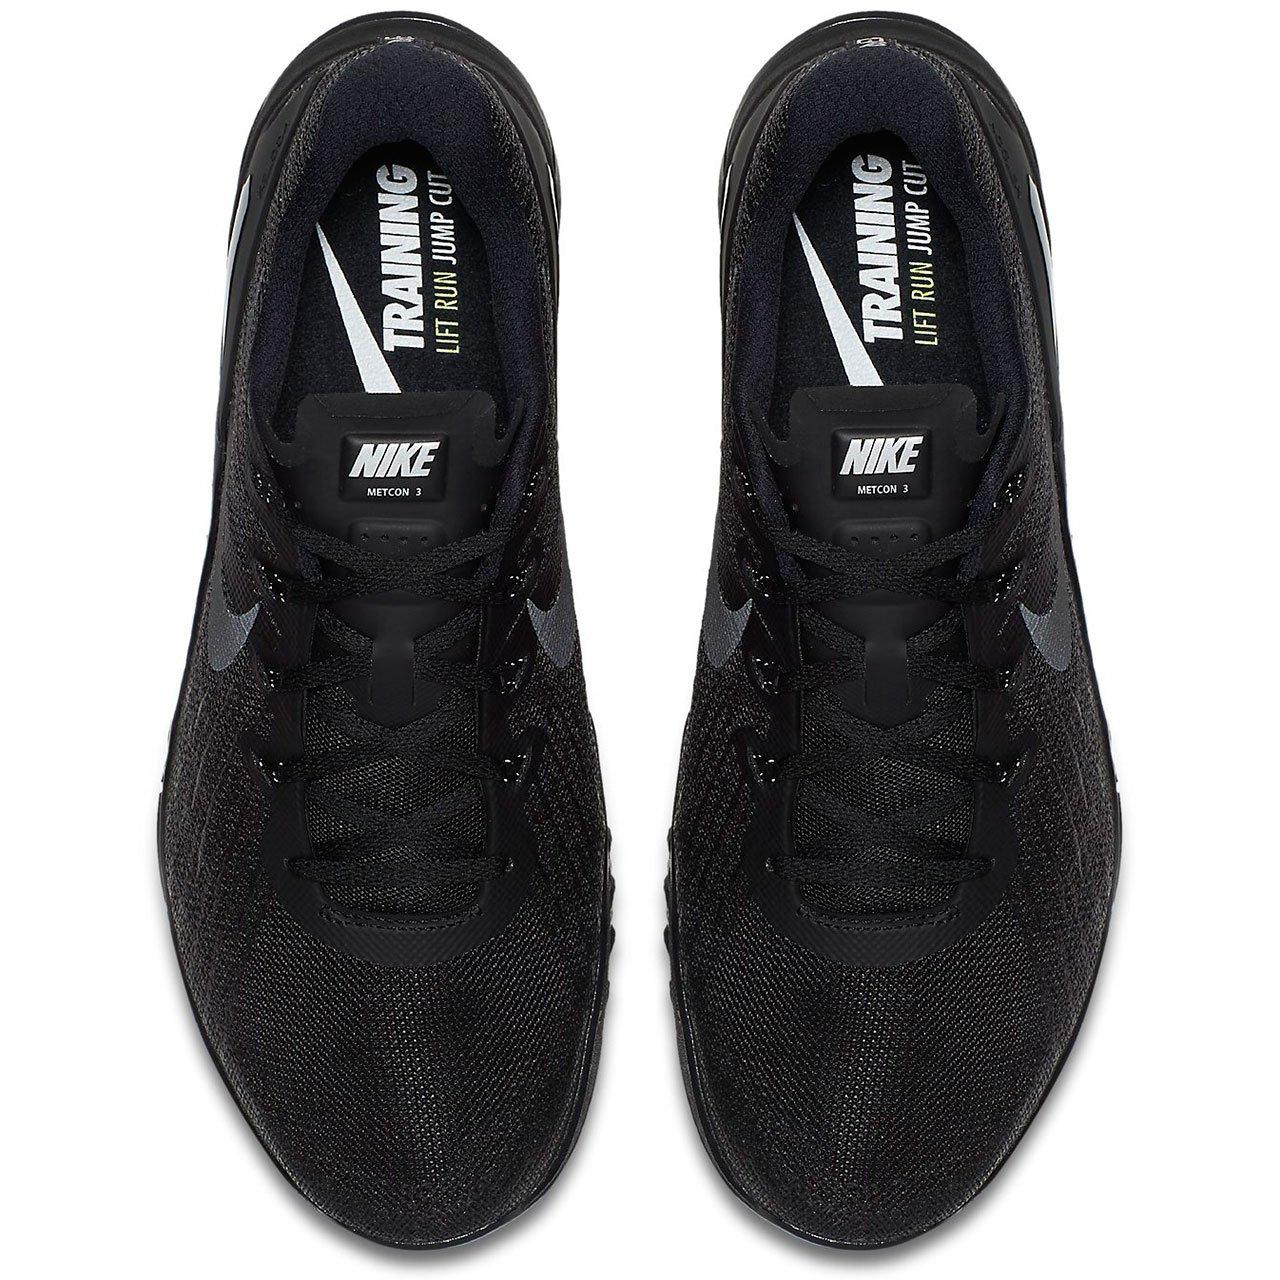 d6fcc538b4b9e Nike Metcon 3 Mens Trainers 852928 Sneakers Shoes (UK 6 US 7 EU 40, Black  Black 002)